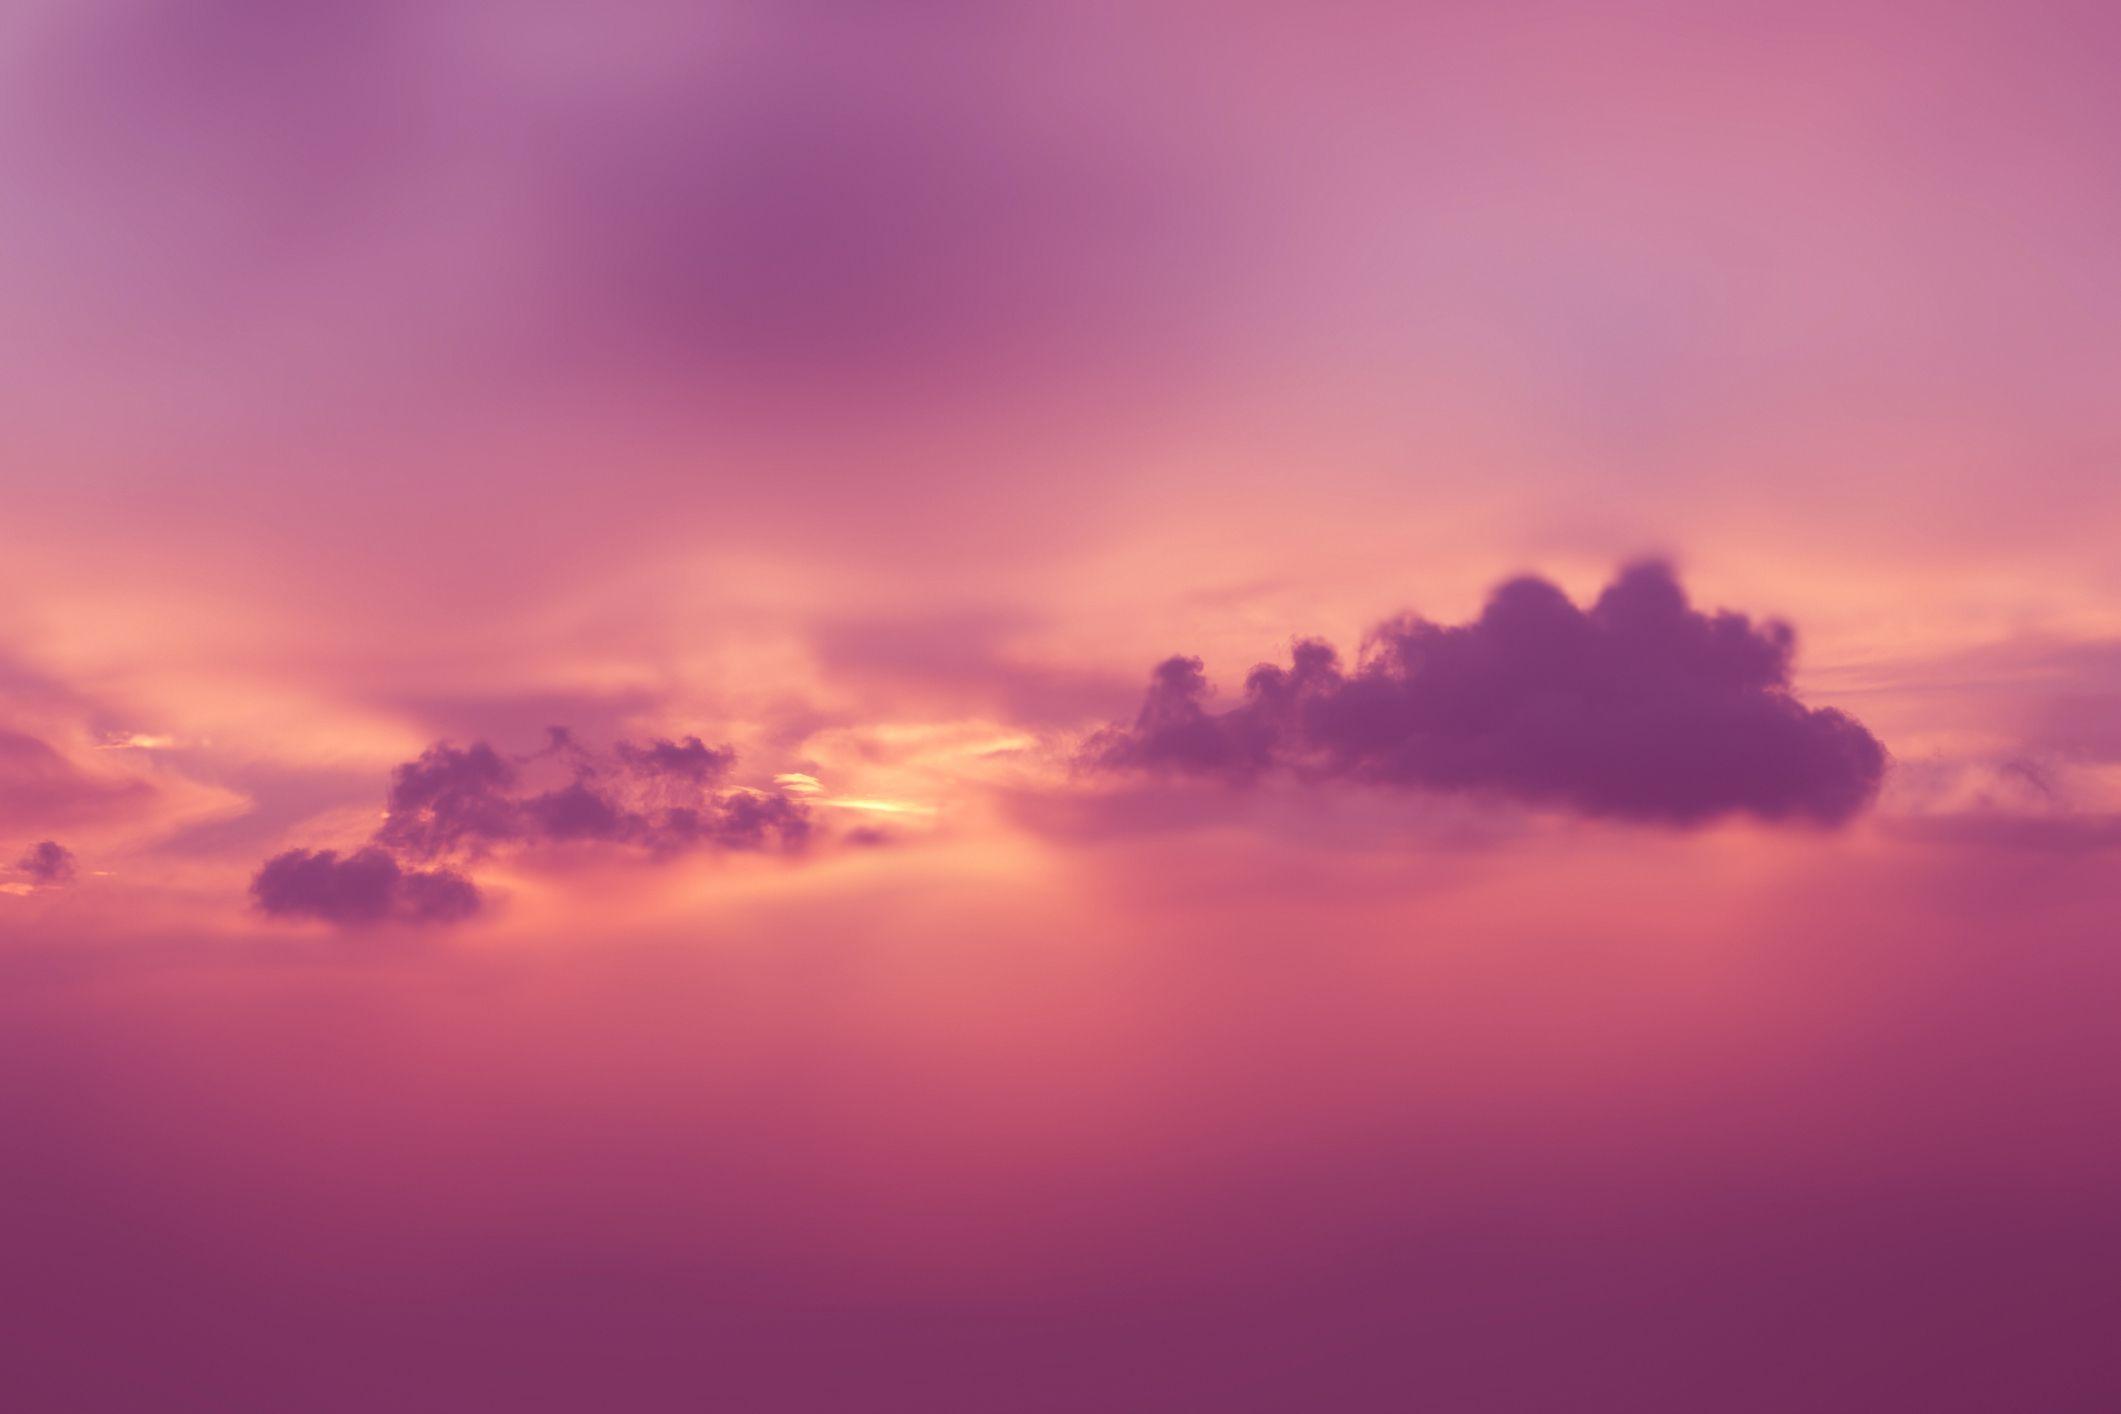 Orange and magenta clouds